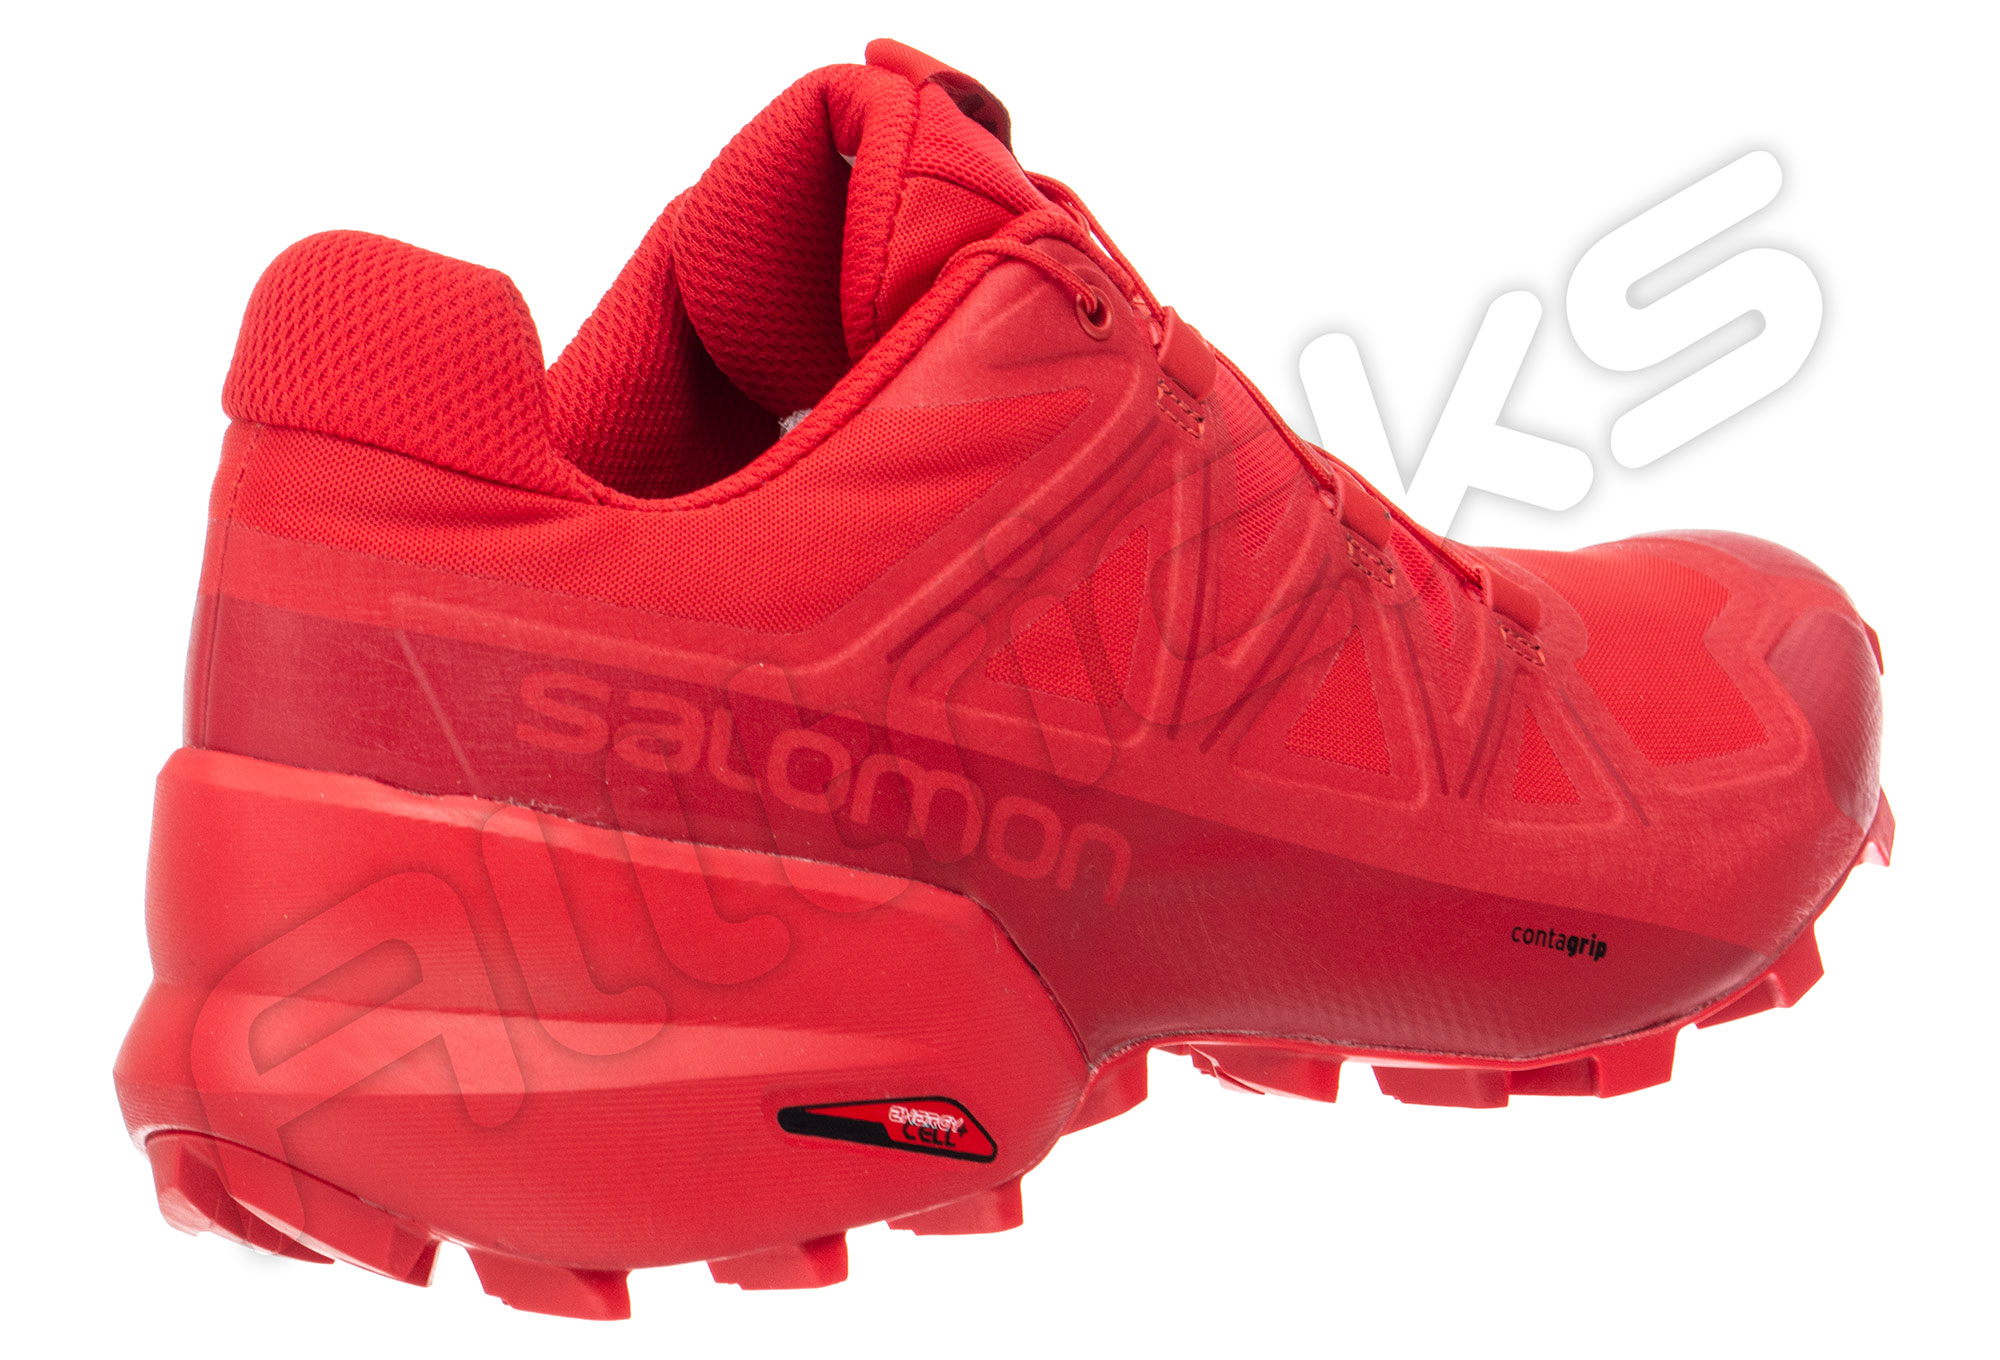 salomon speedcross 3 red 32